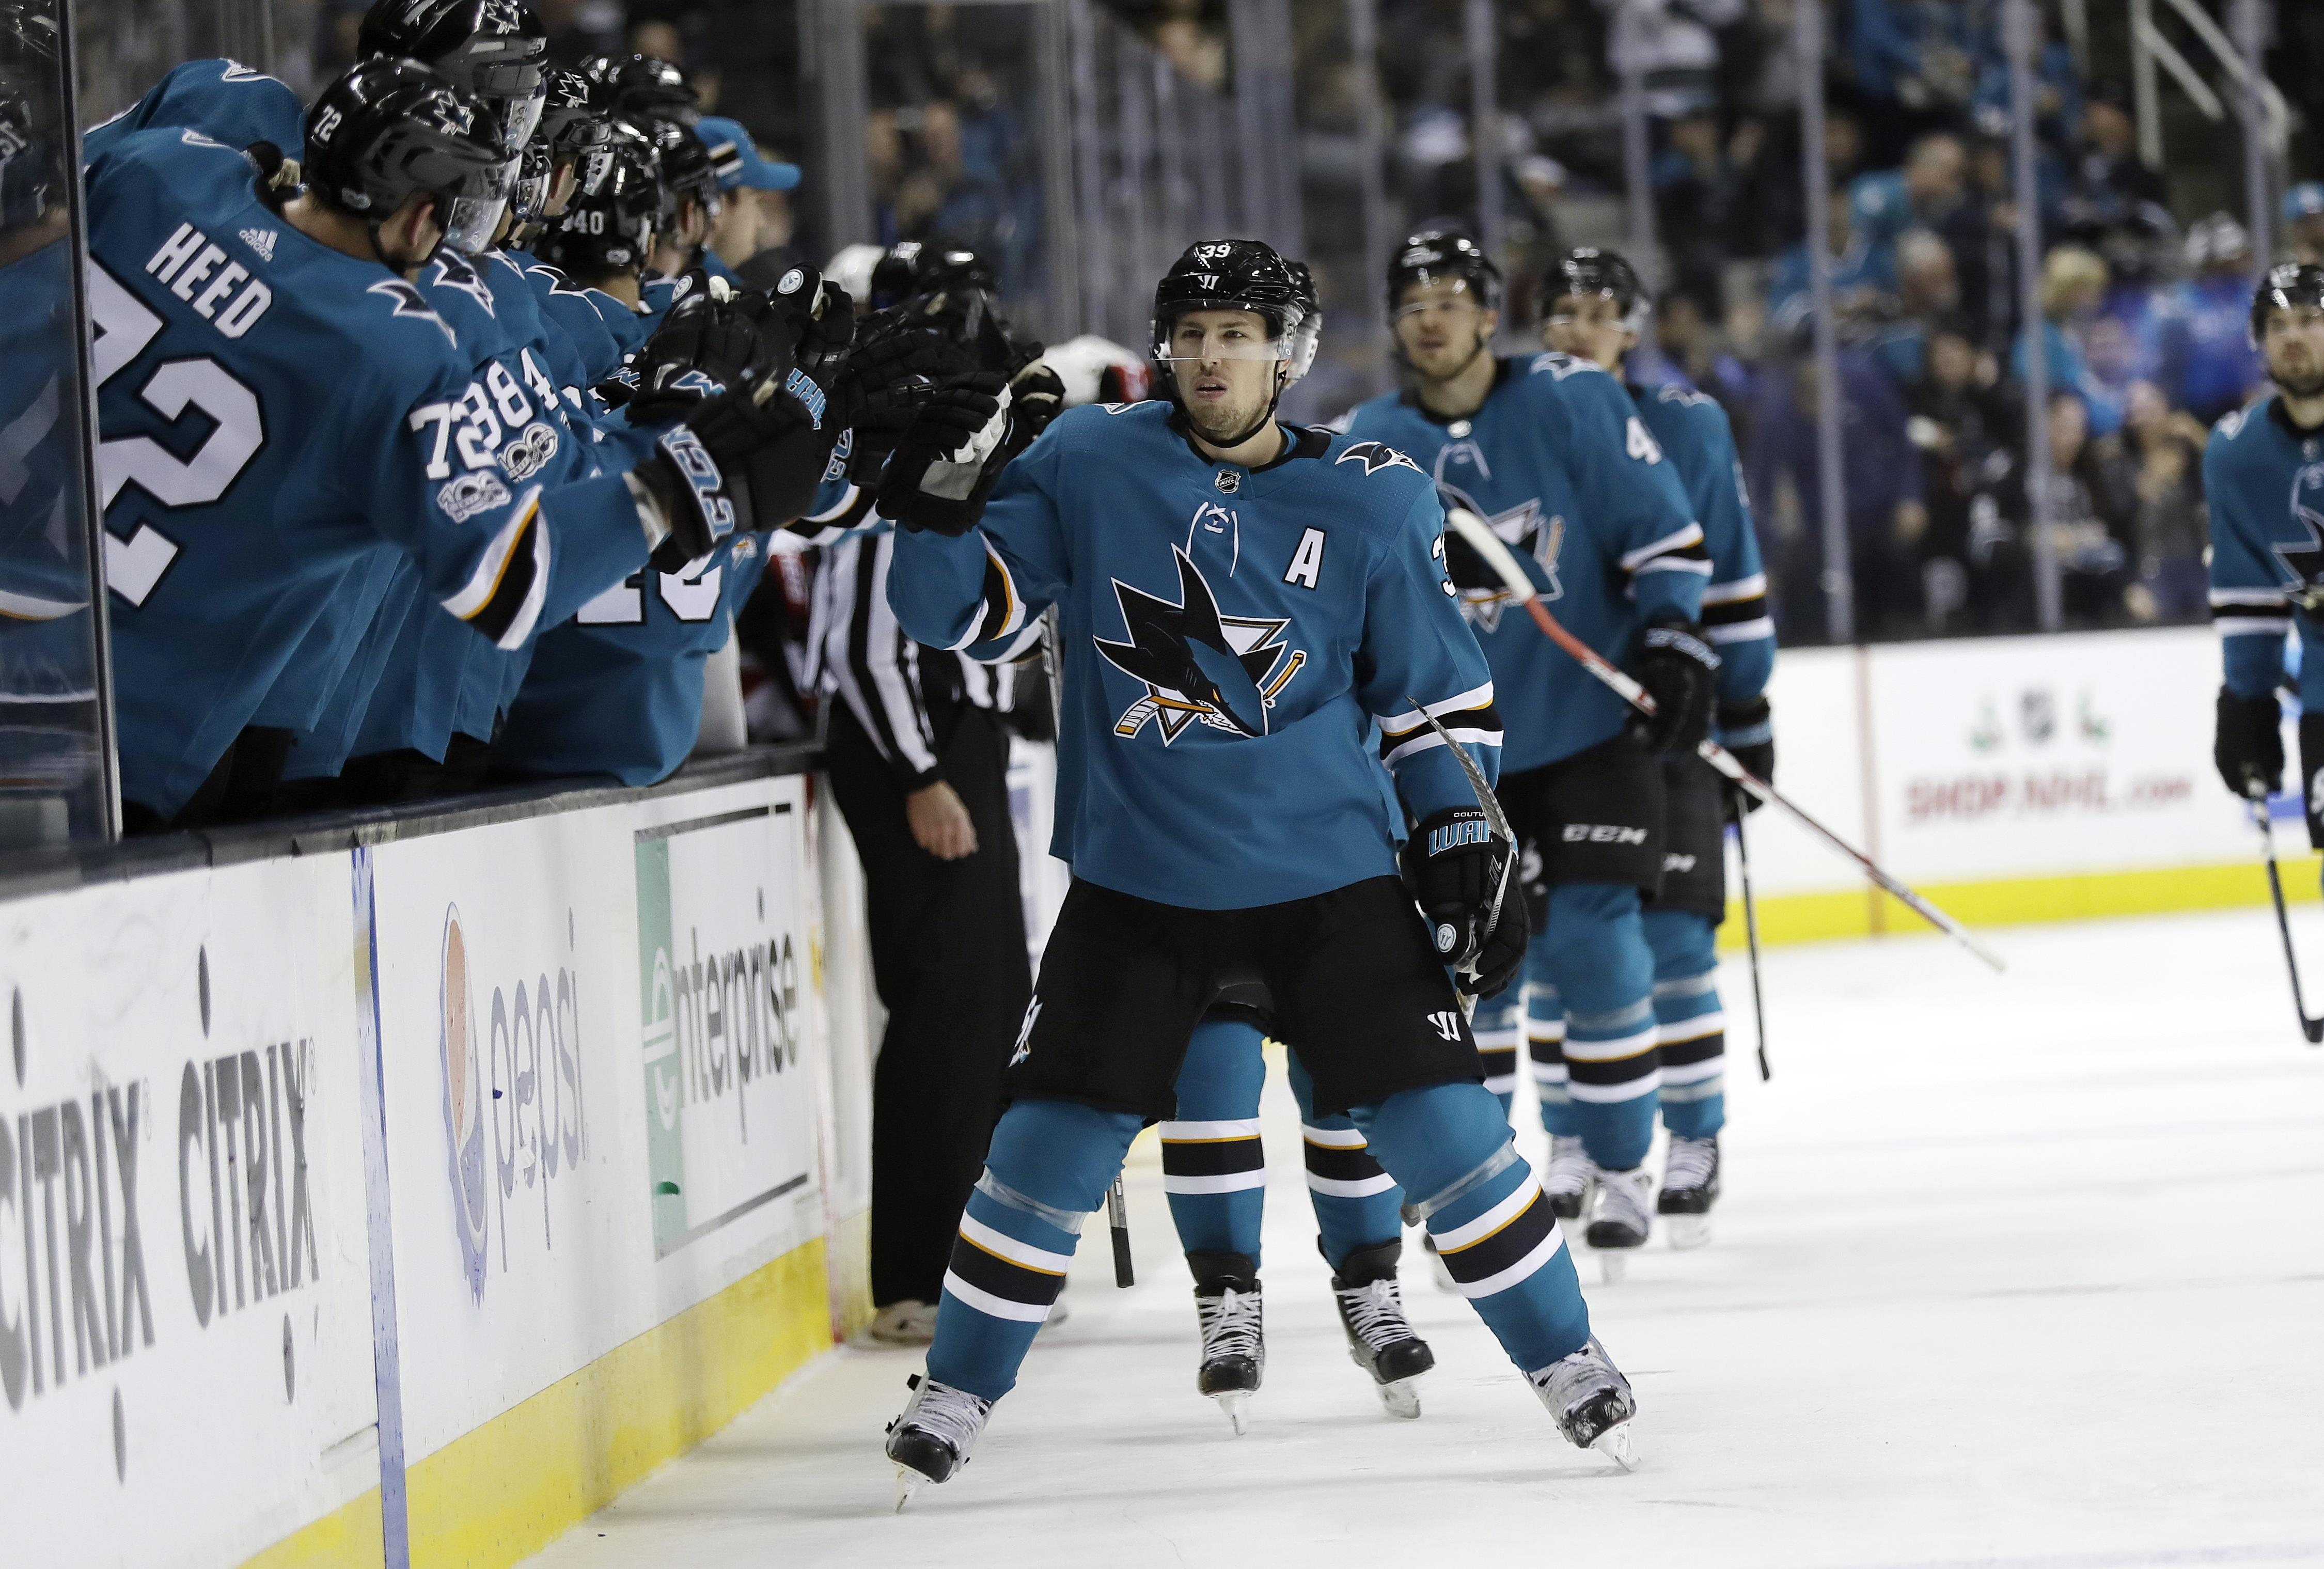 Senators_sharks_hockey_07998